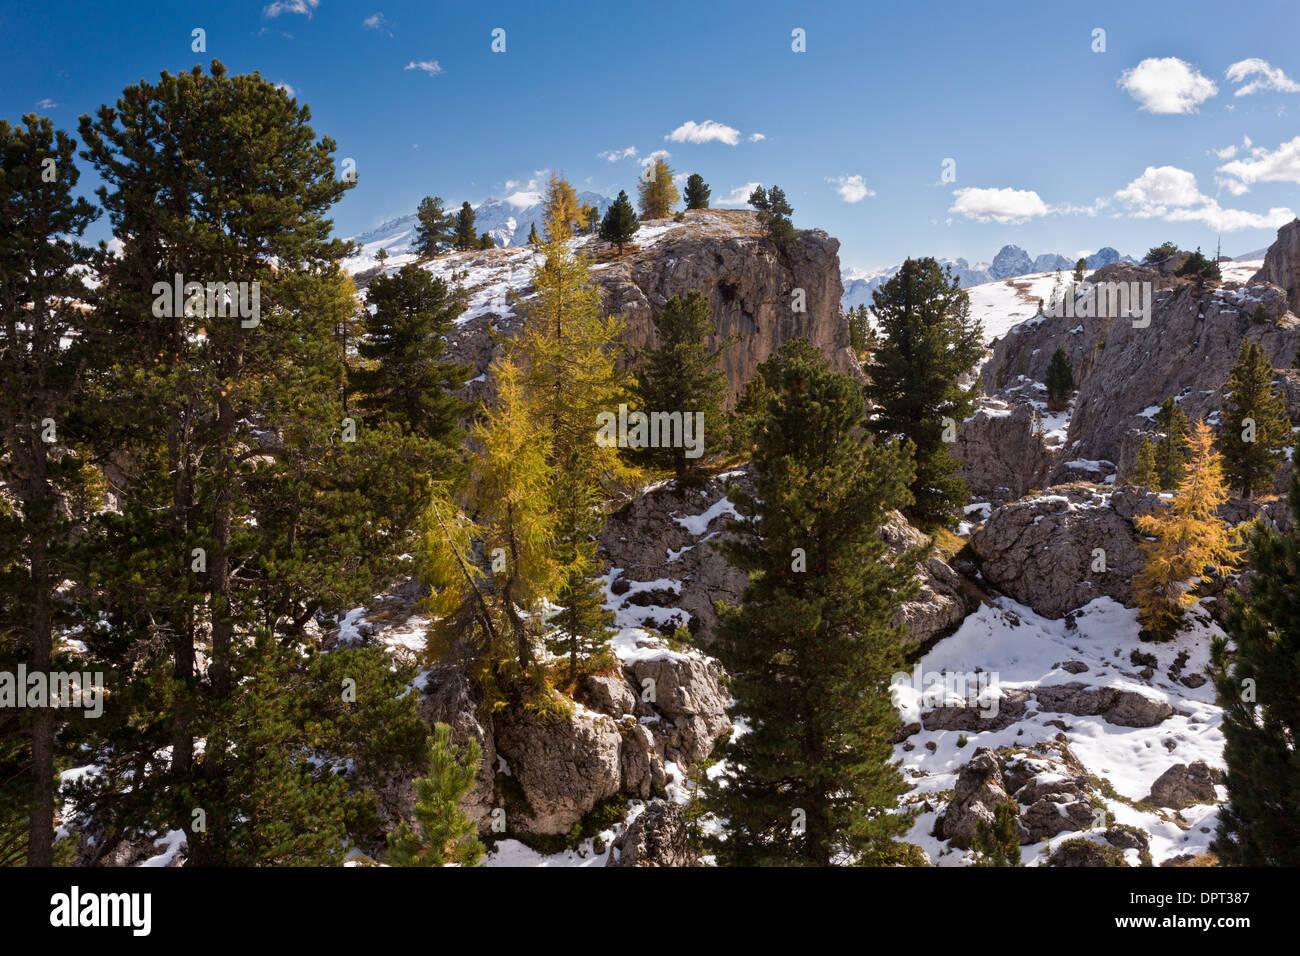 The Stone City or Citta dei Sassi, dolomitic rocks, in autumn; Dolomites, north Italy. - Stock Image